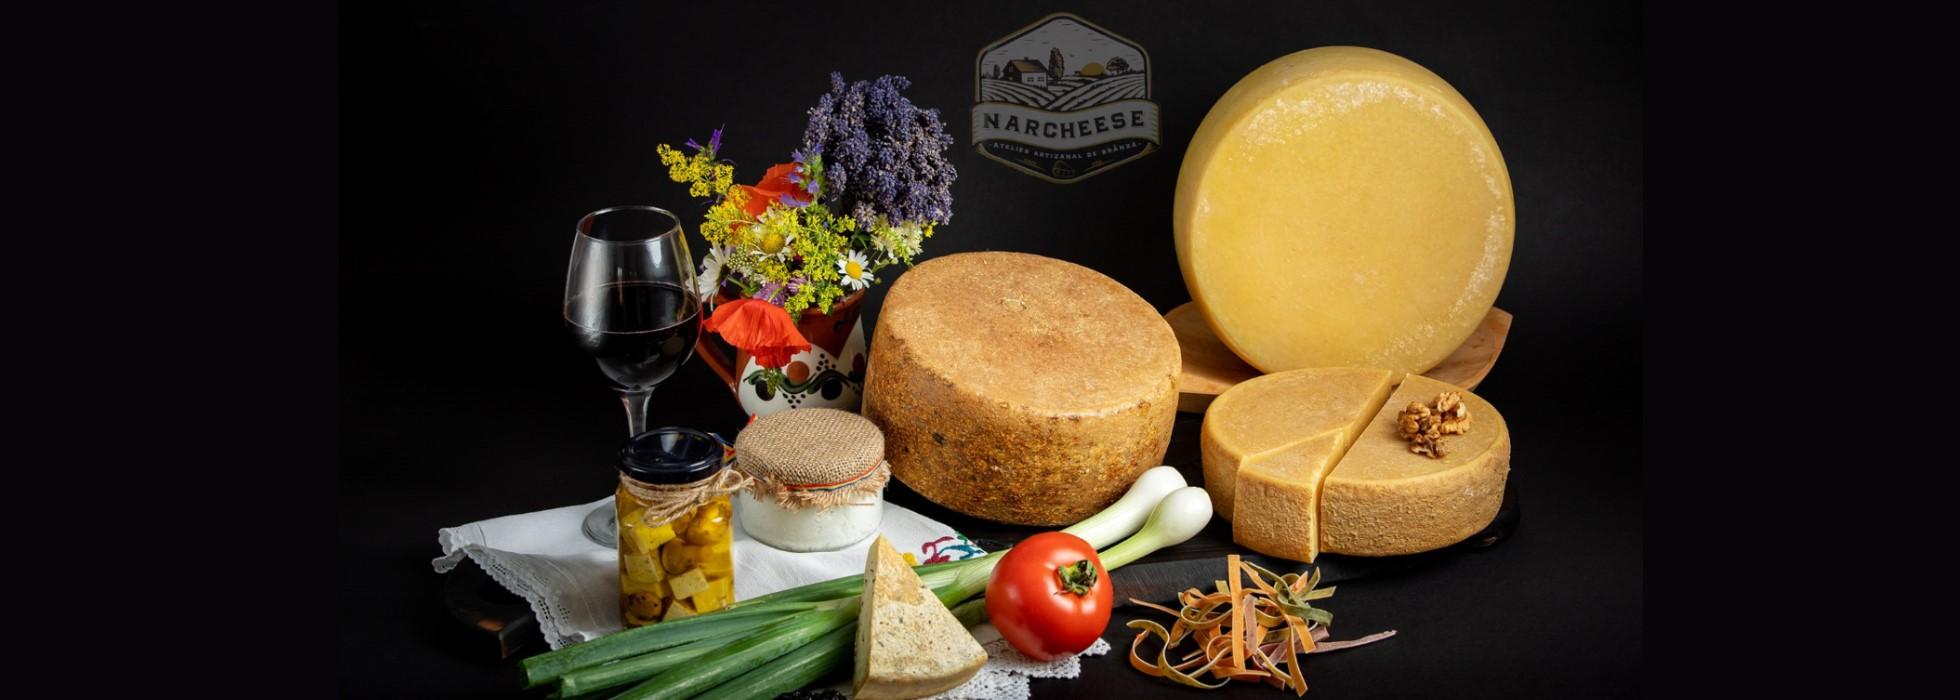 omul de brânză de brânză de brânză